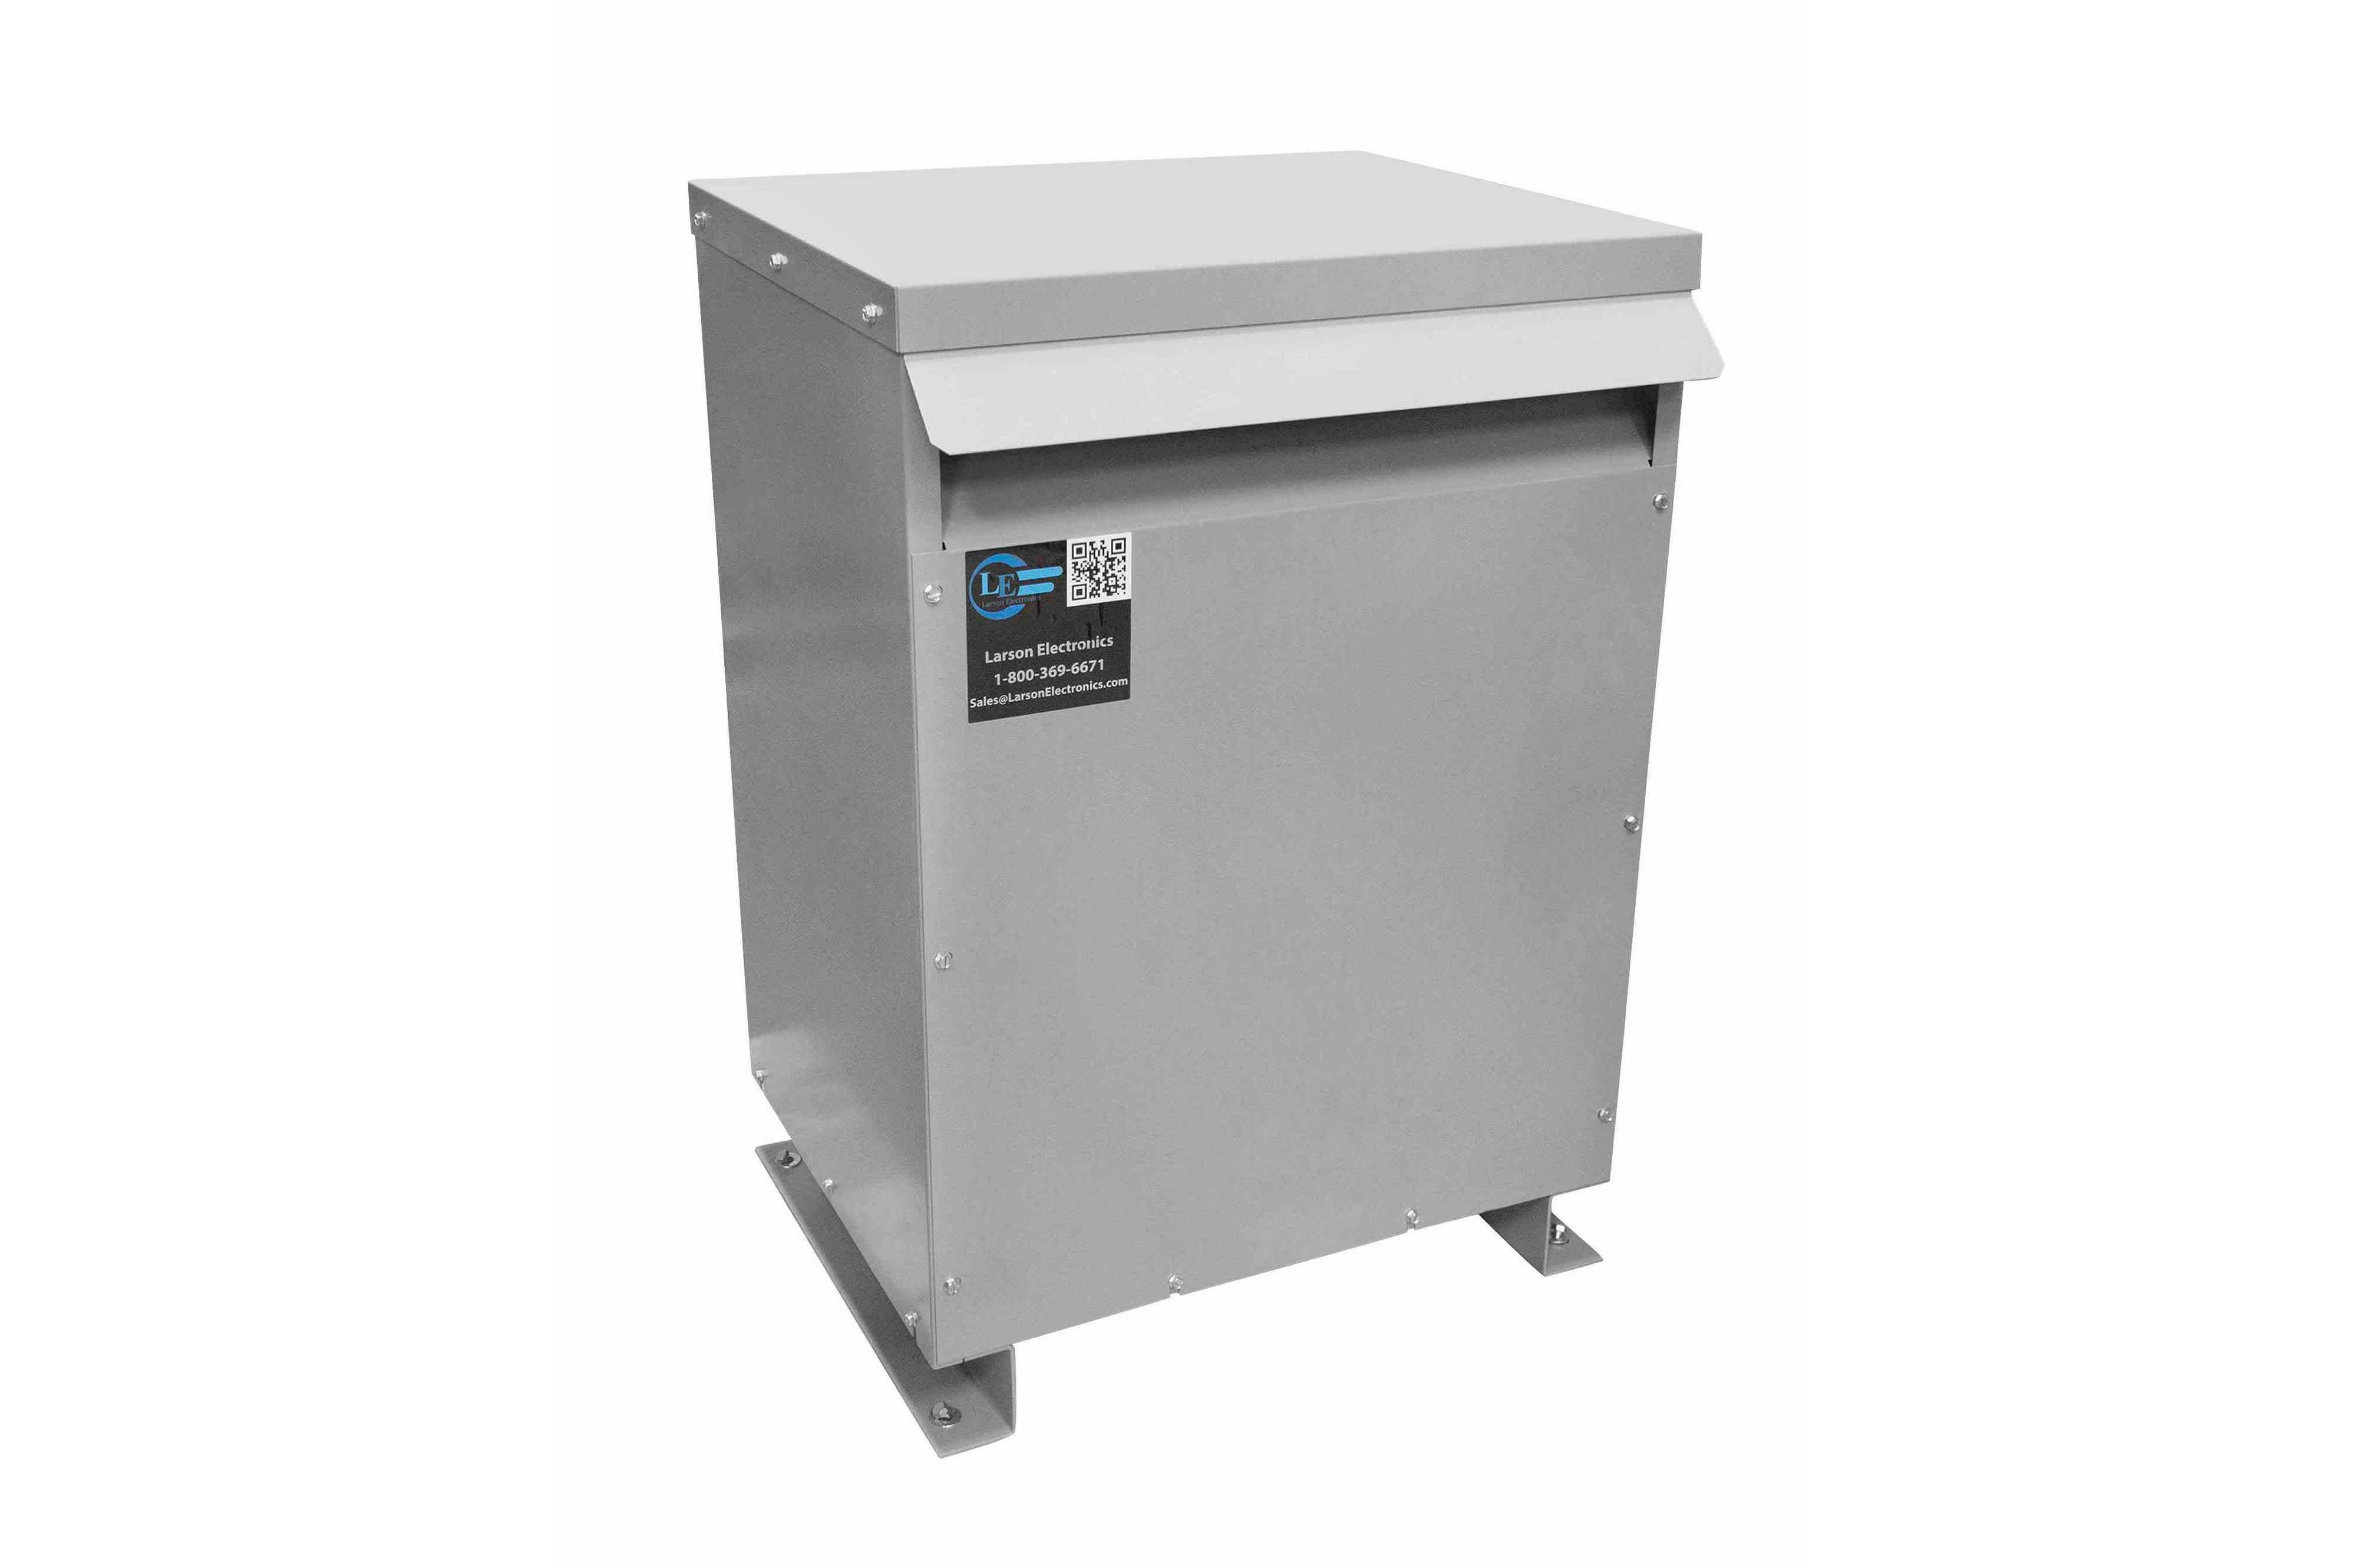 75 kVA 3PH Isolation Transformer, 600V Wye Primary, 415Y/240 Wye-N Secondary, N3R, Ventilated, 60 Hz